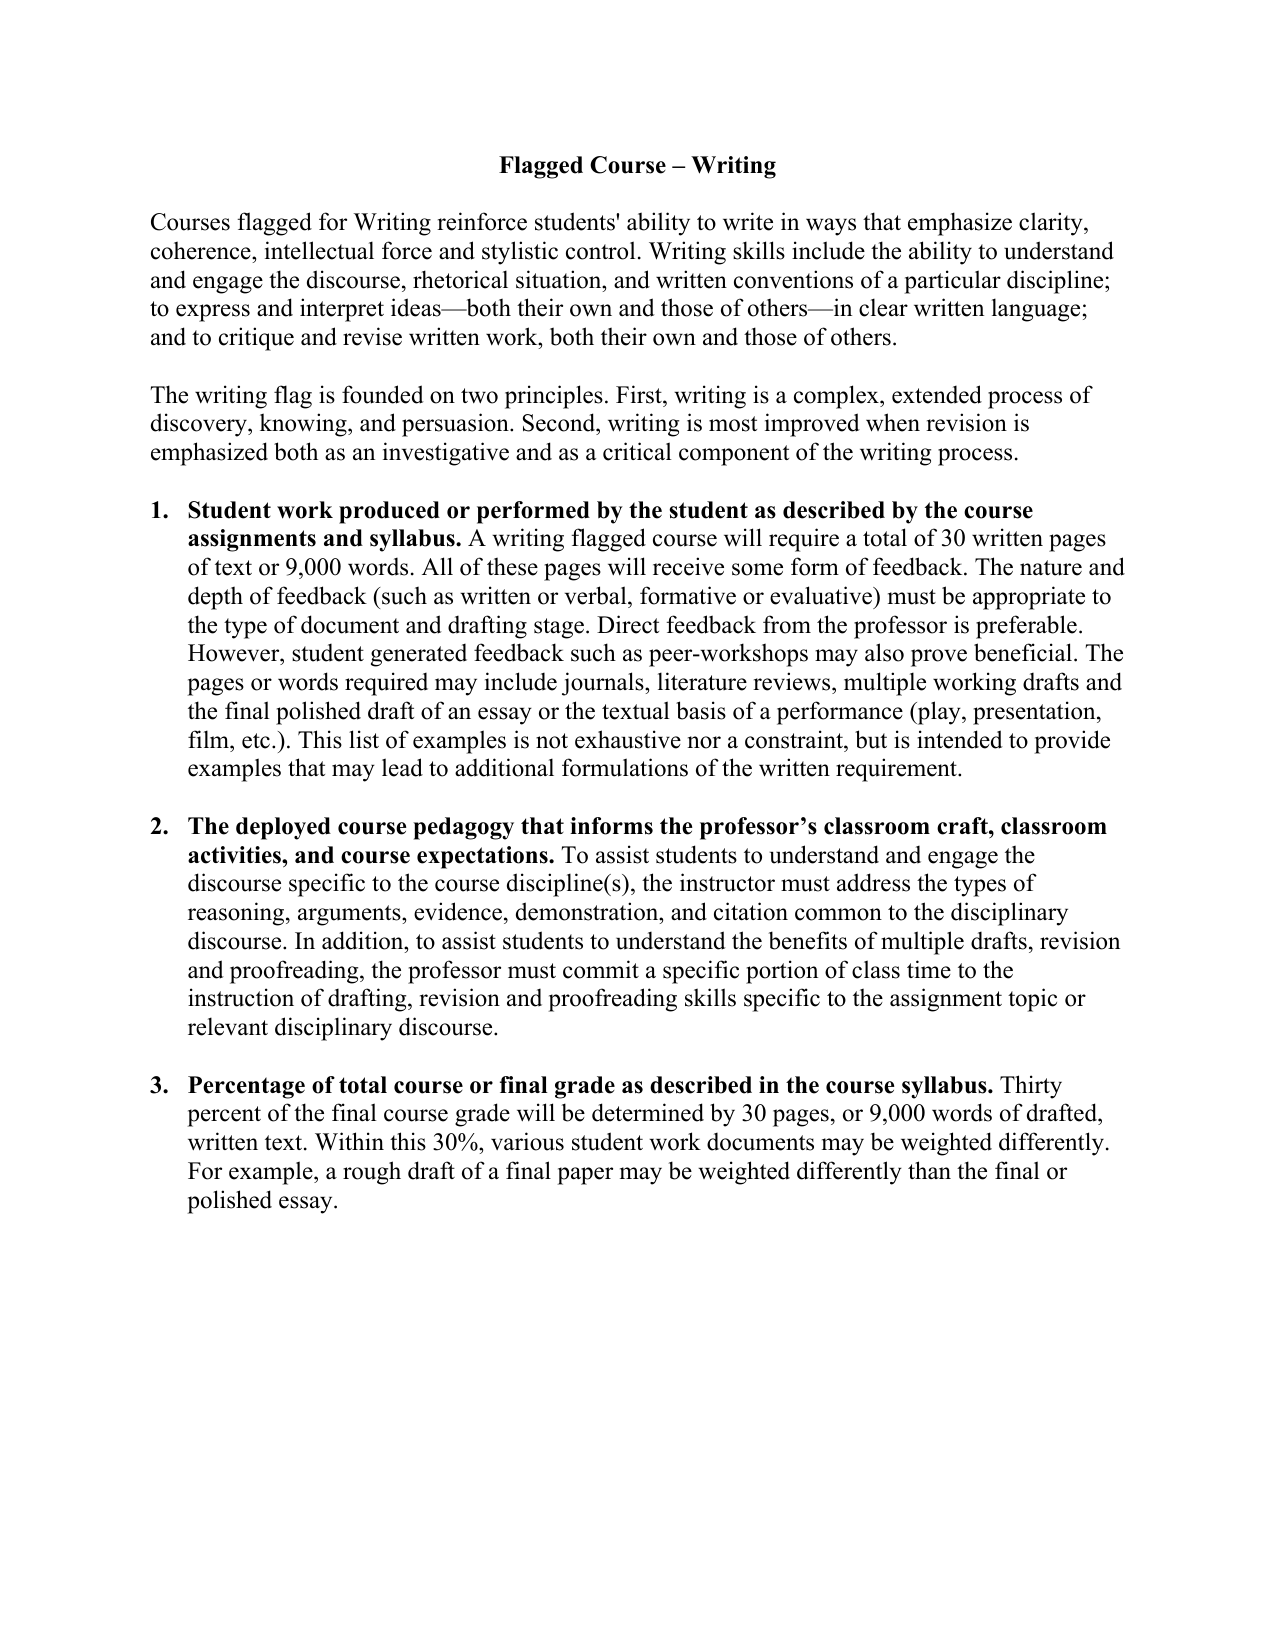 Help writing cheap rhetorical analysis essay on usa sample resume for non profit